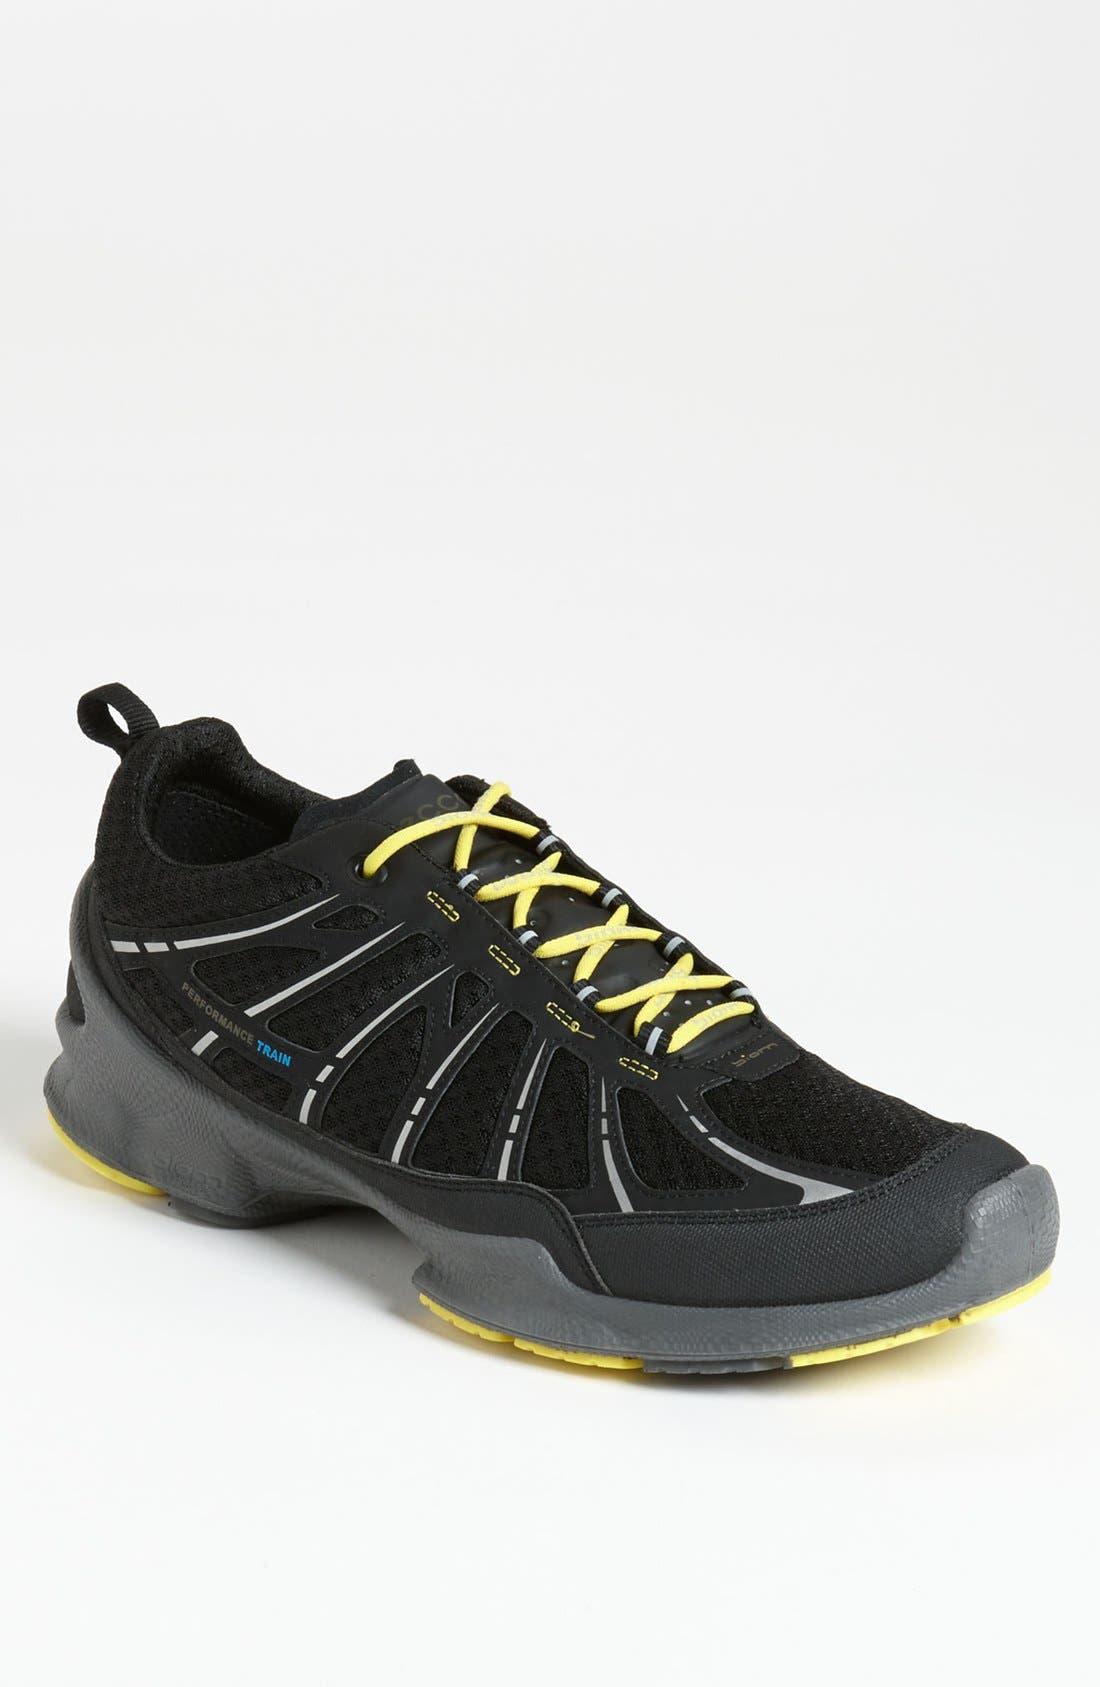 Alternate Image 1 Selected - ECCO 'Biom Core' Training Shoe (Men)